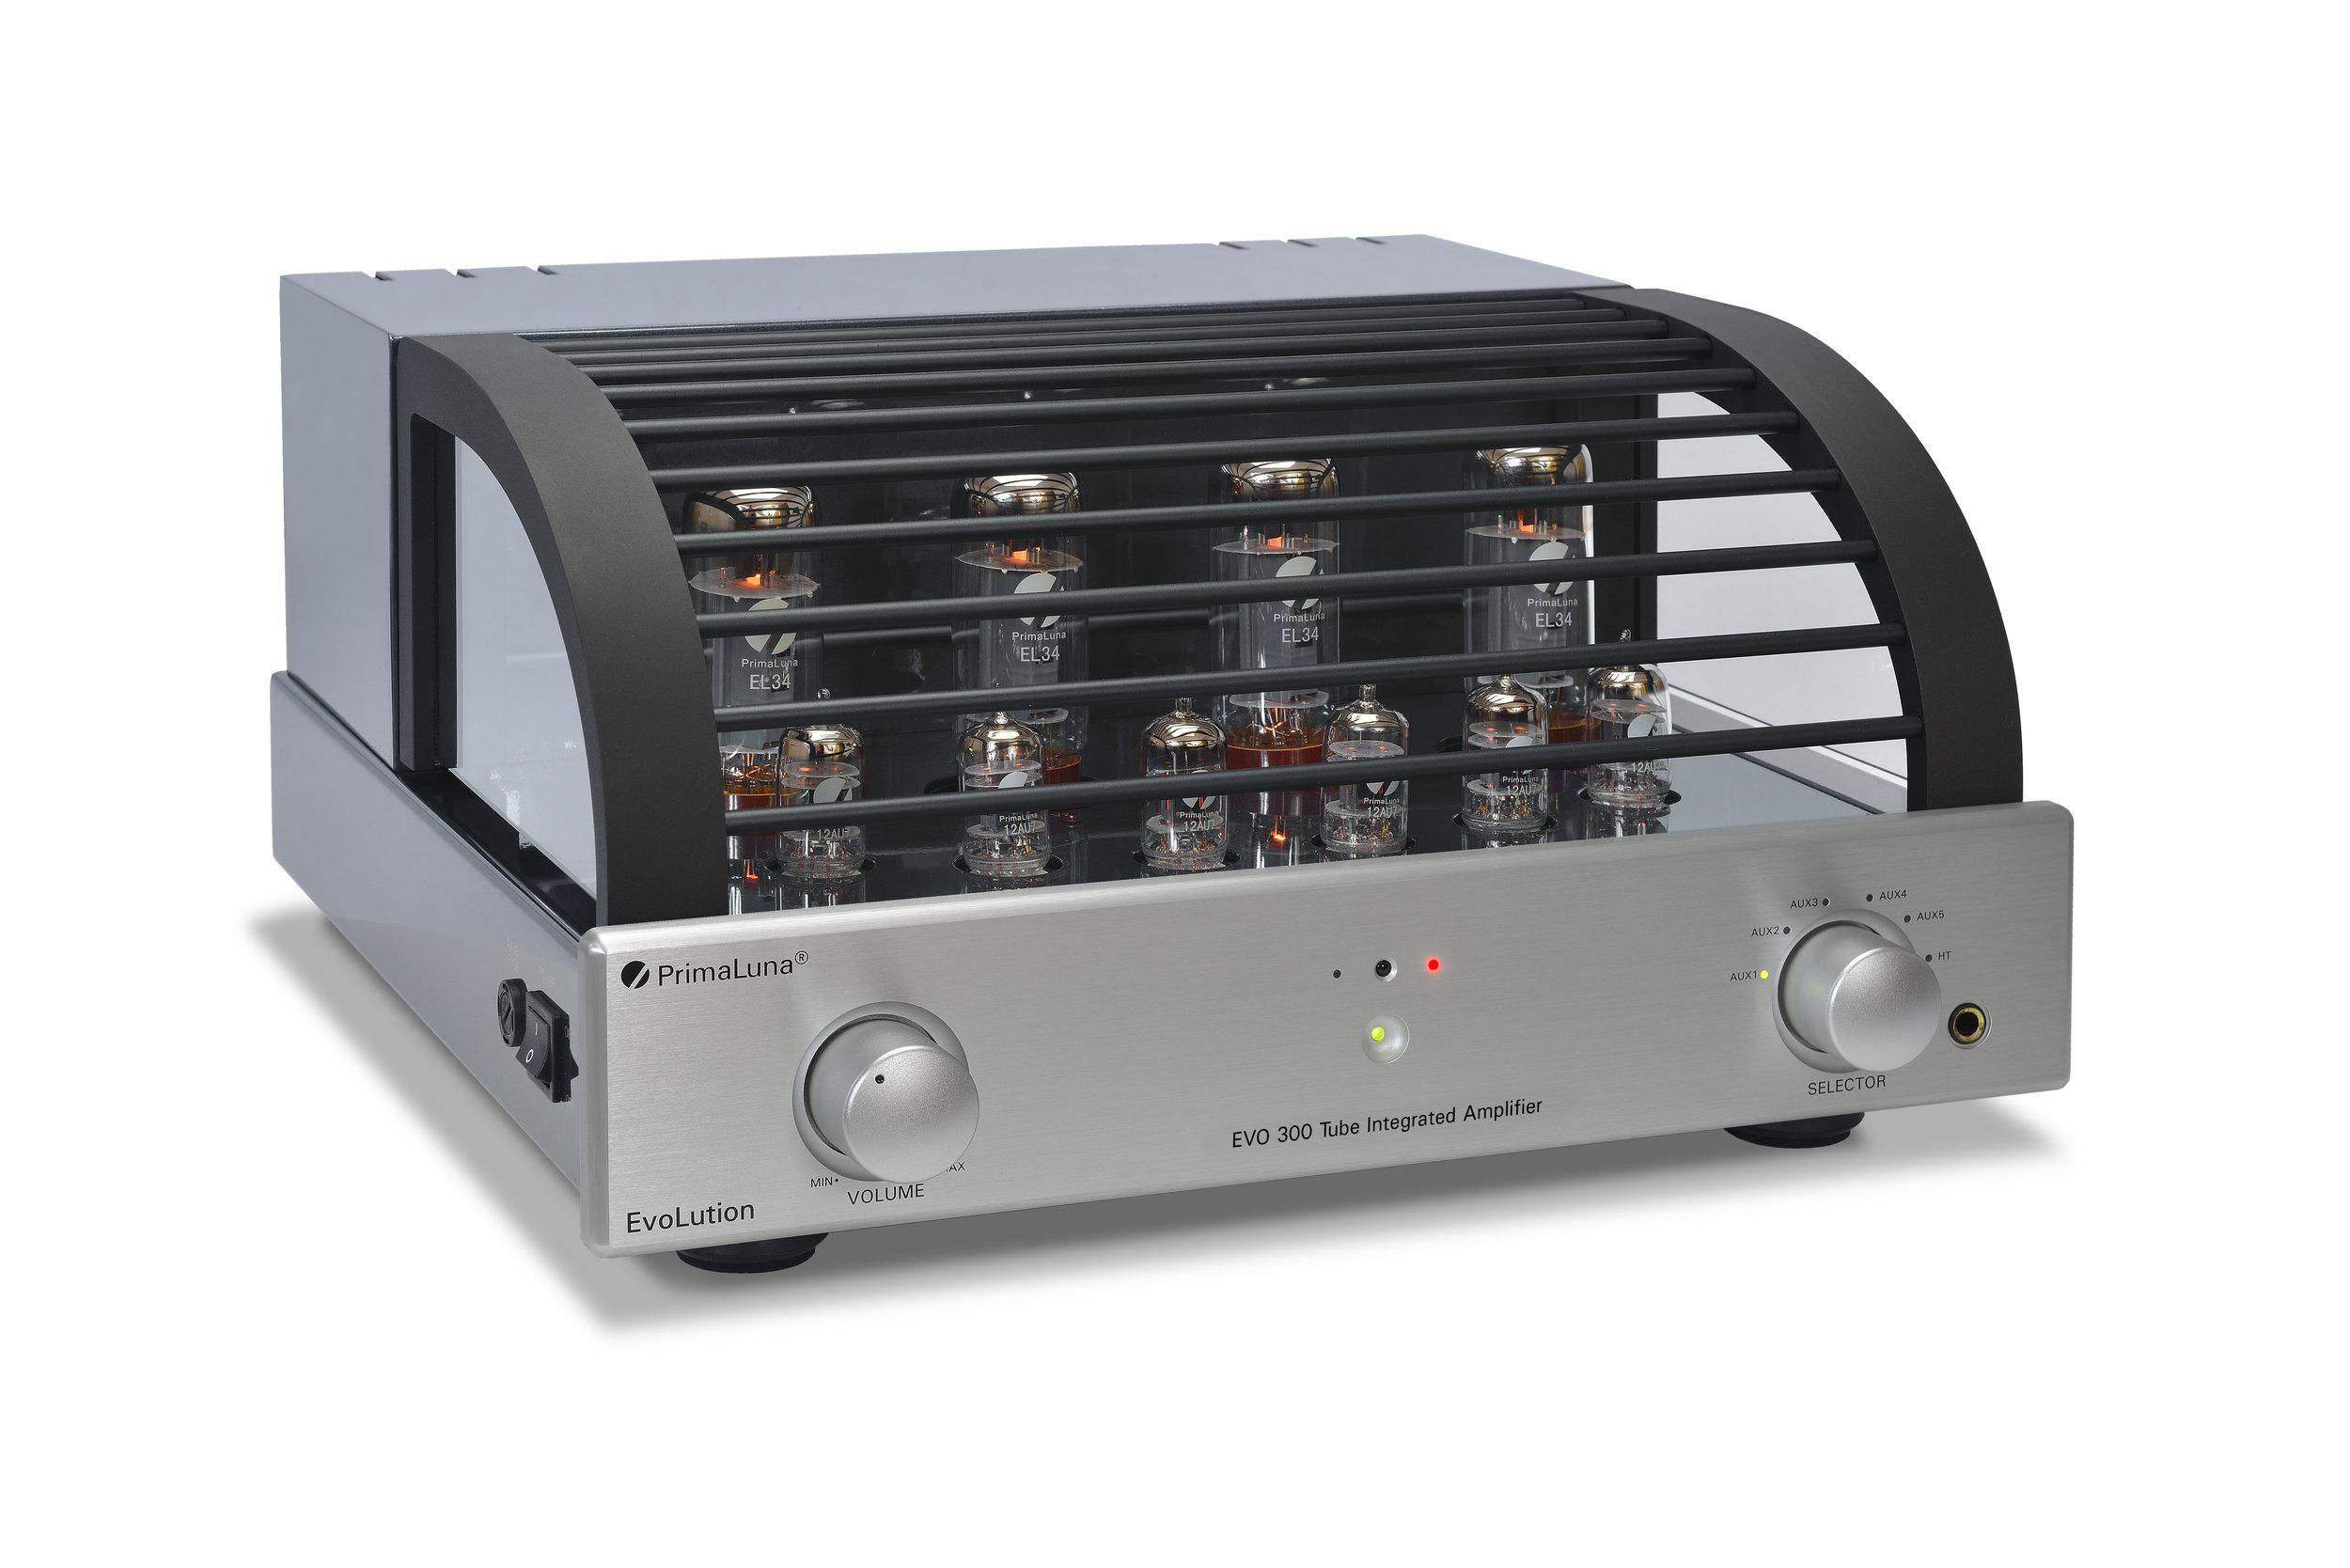 044 - PrimaLuna Evo 300 Tube Integrated Amplifier - silver - slanted - white background - kopie.jpg